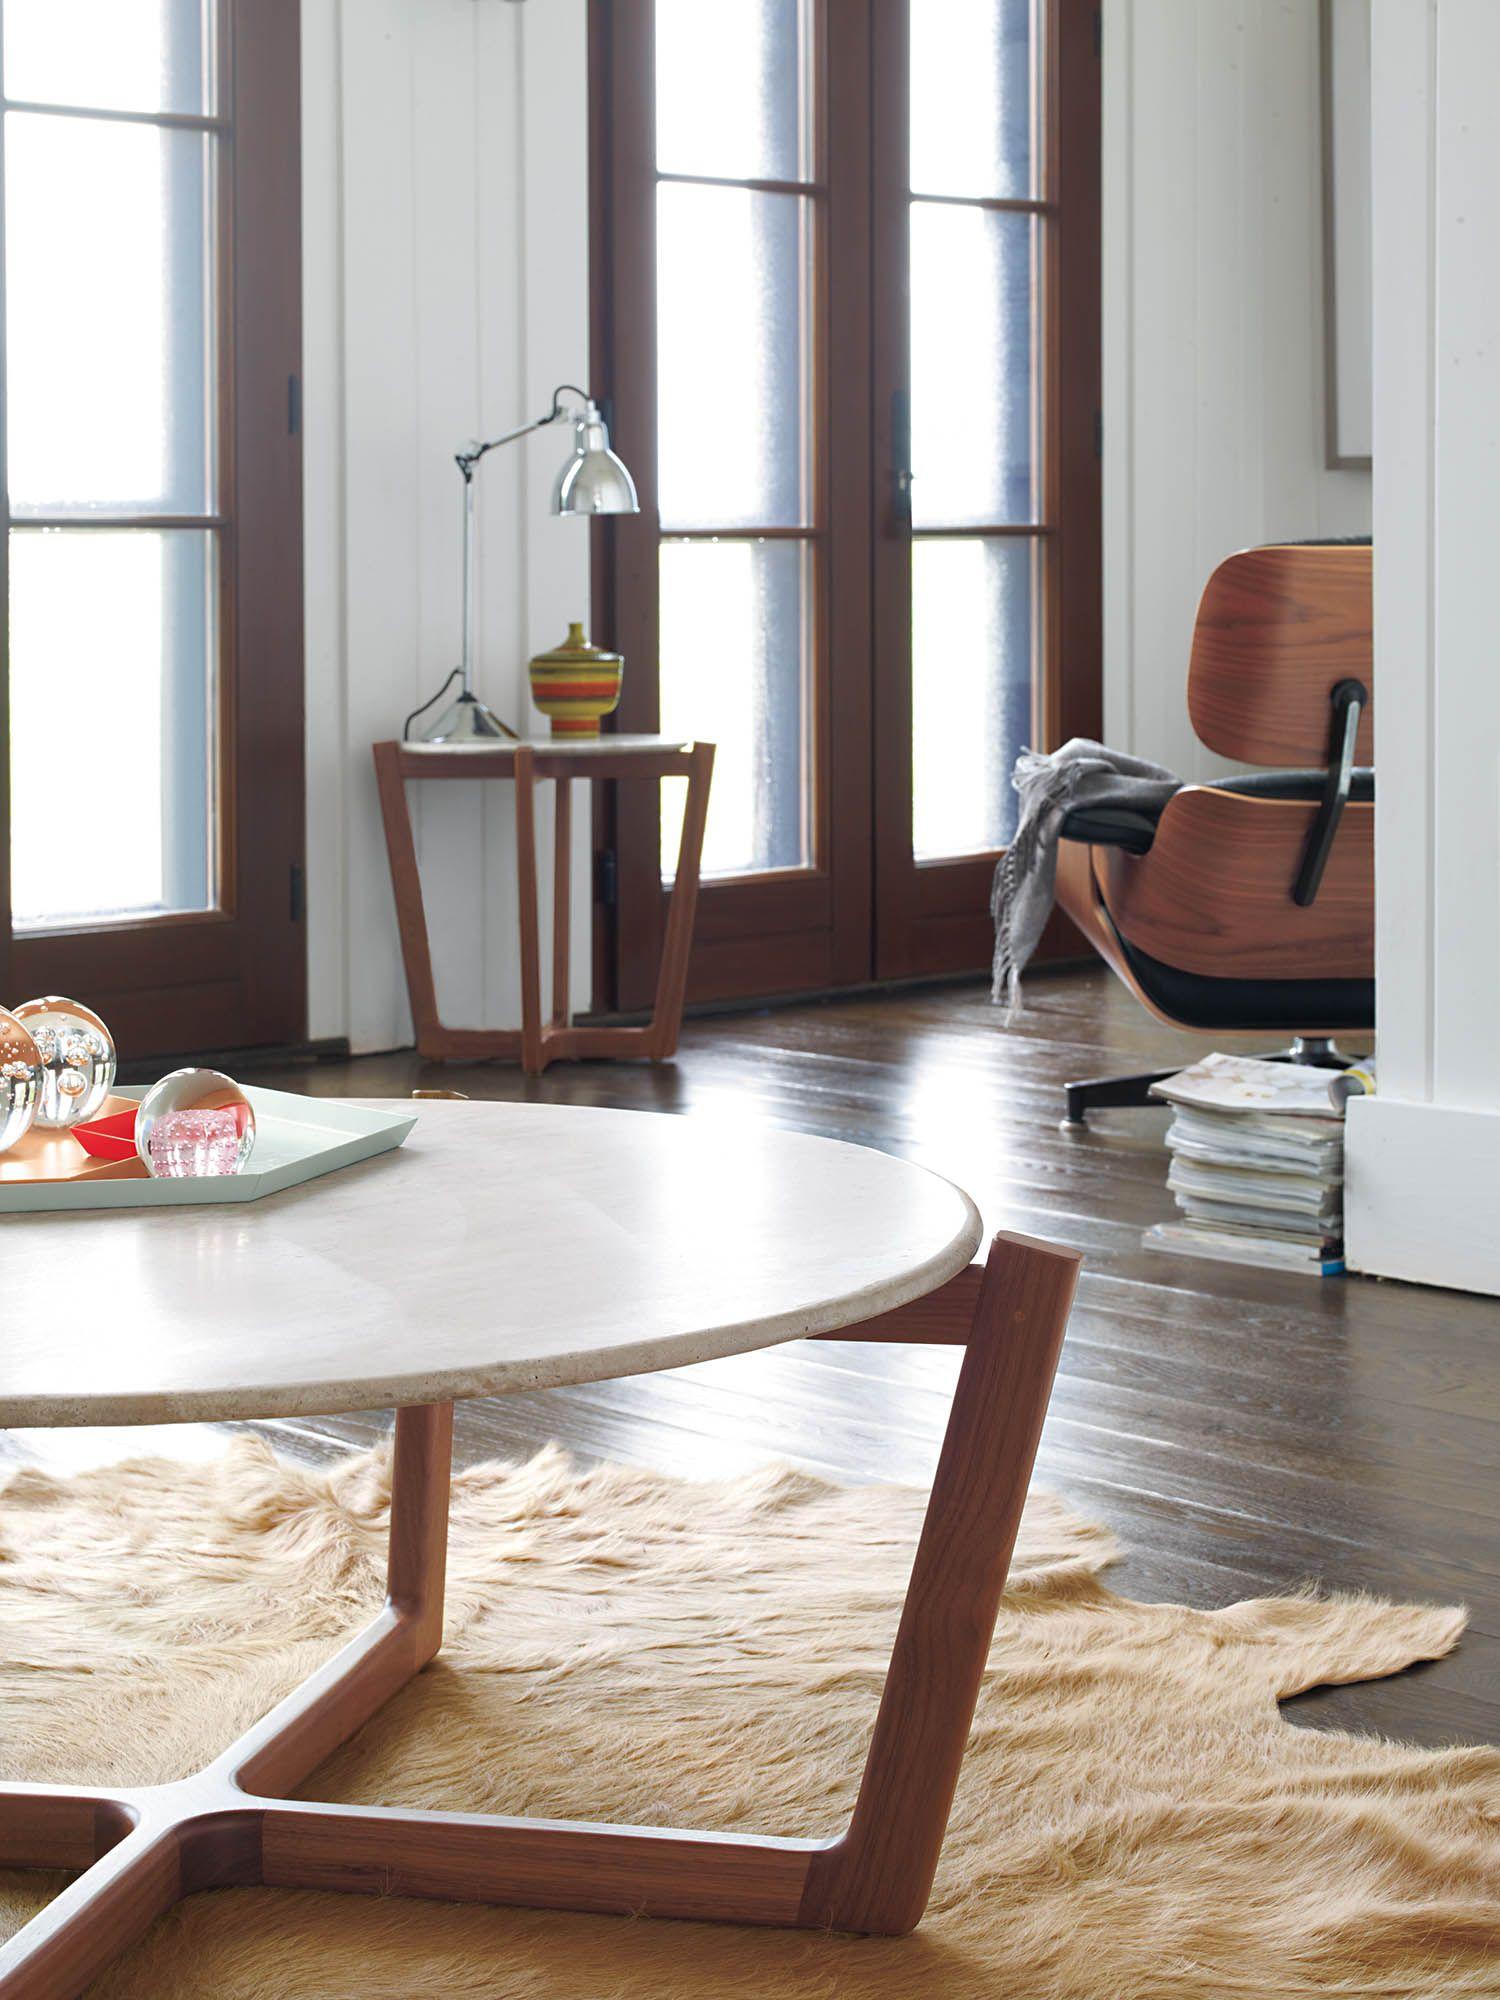 Atlas Coffee Table | Furniture design, Interior design